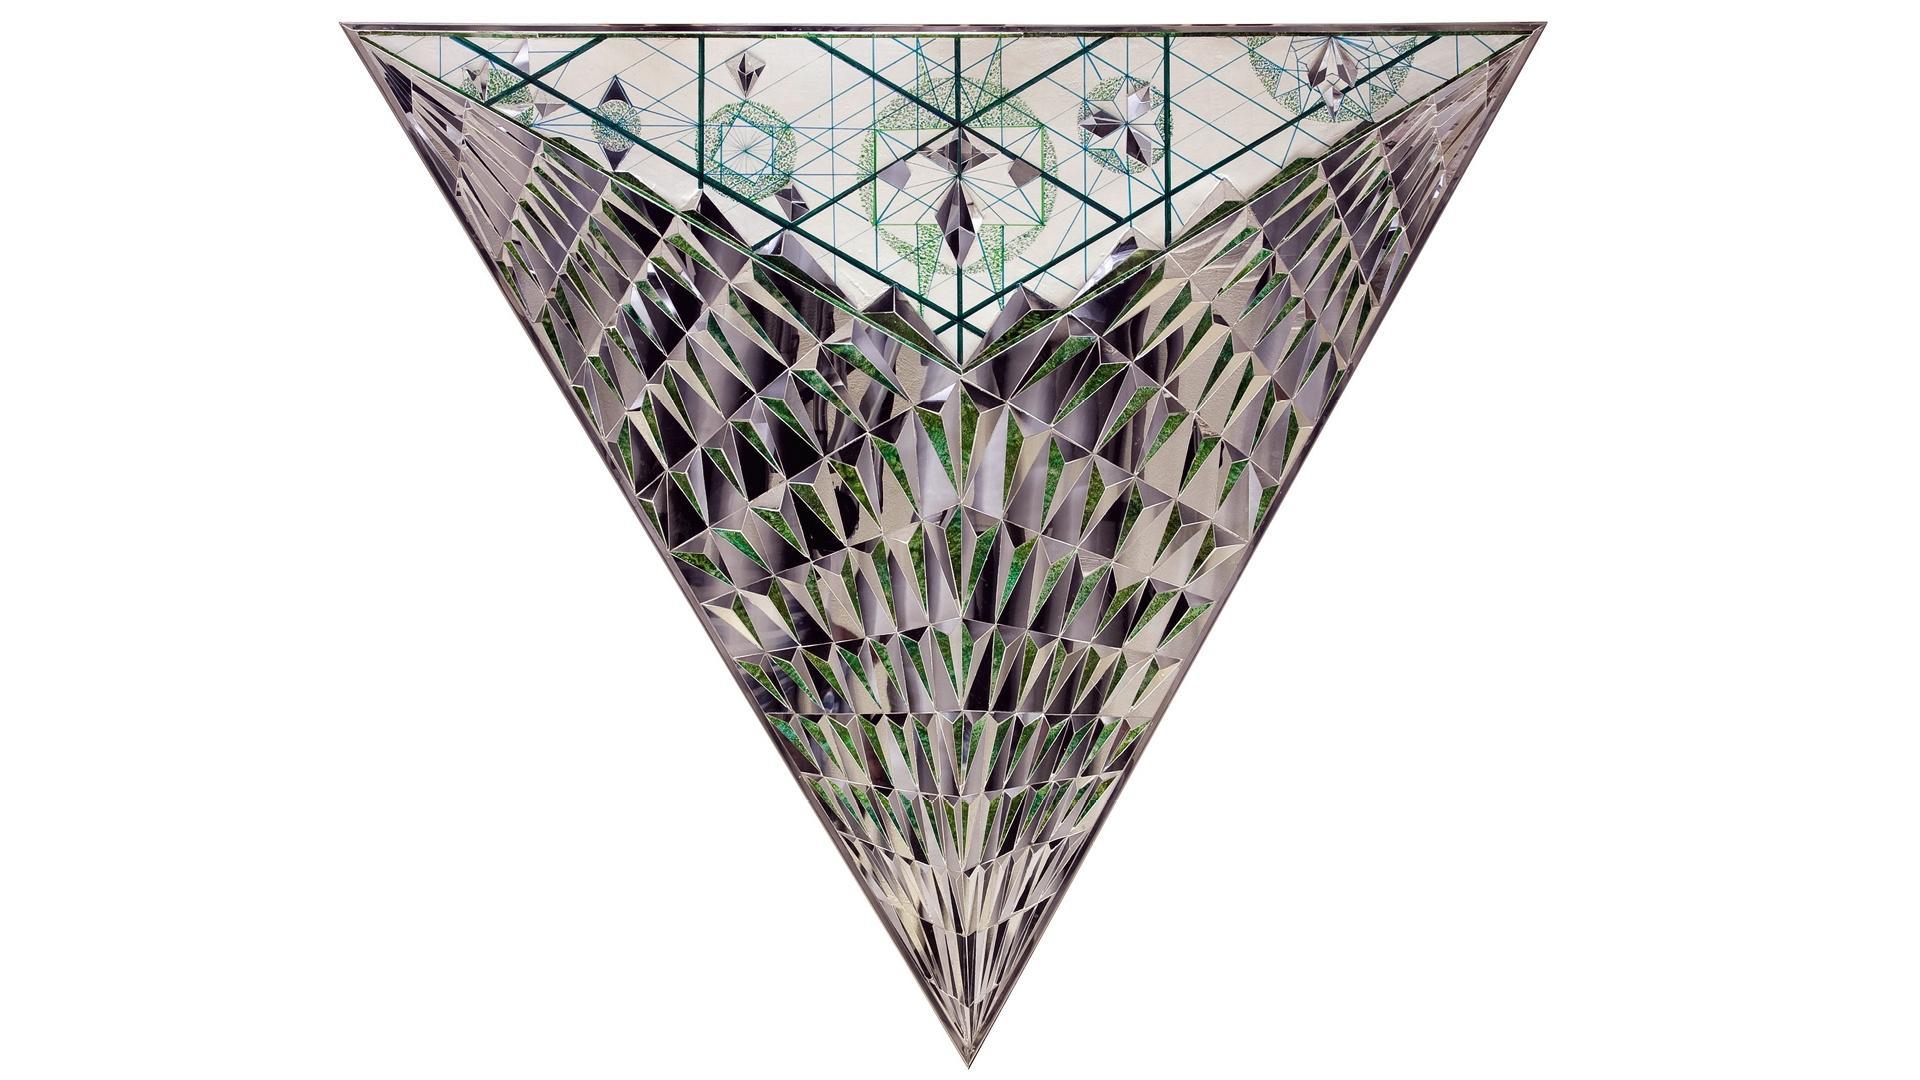 Monir Farmanfarmaian Triangle Of Hope